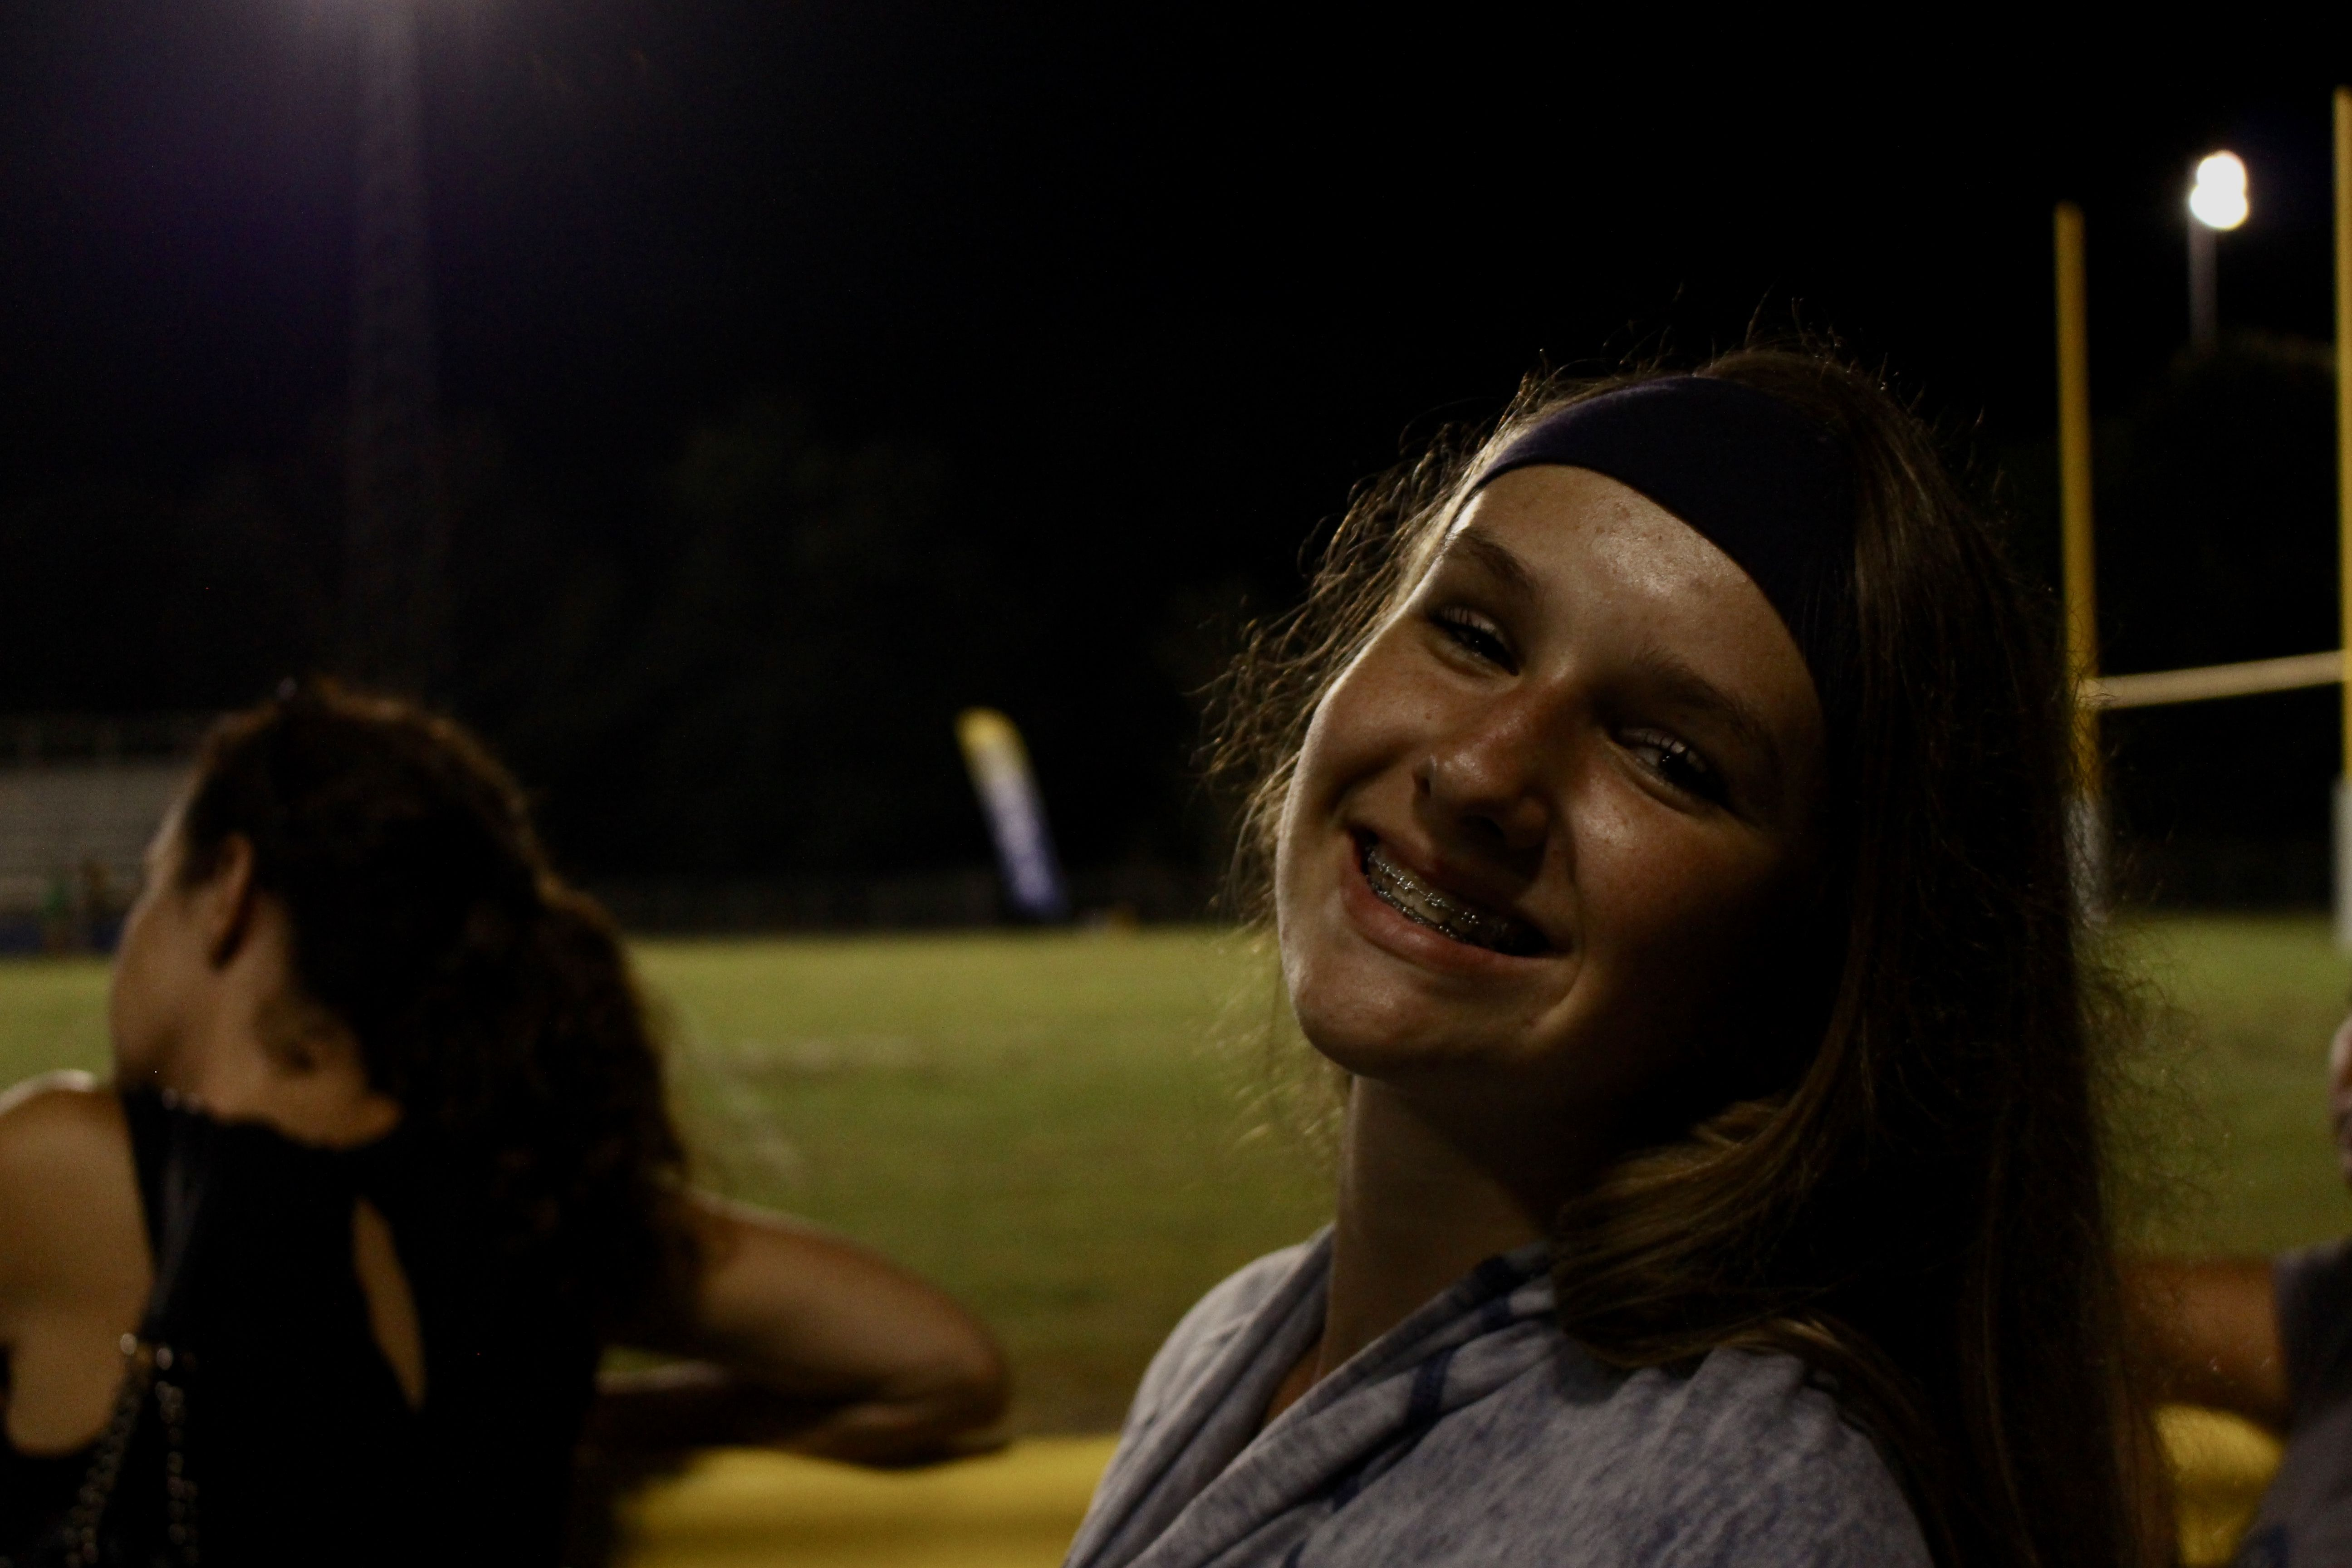 Beautiful Photo Of Alexa Rae Taken At A Lyman Highschool